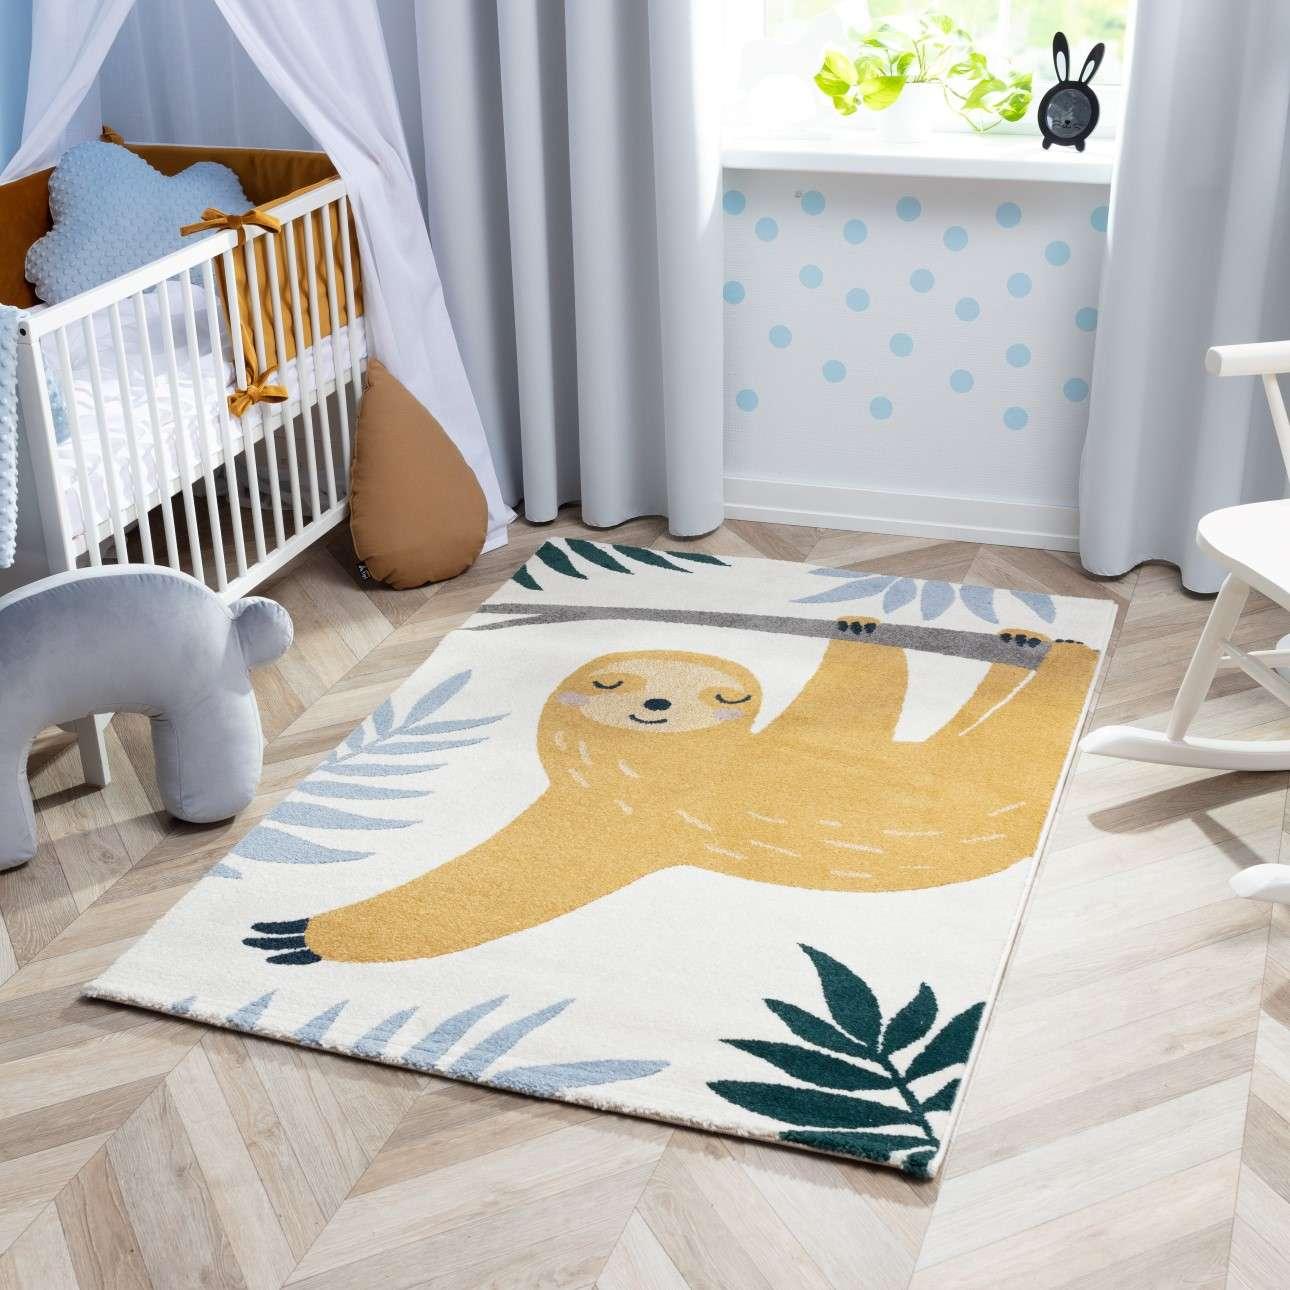 Teppich Happy Sloth 120x170cm